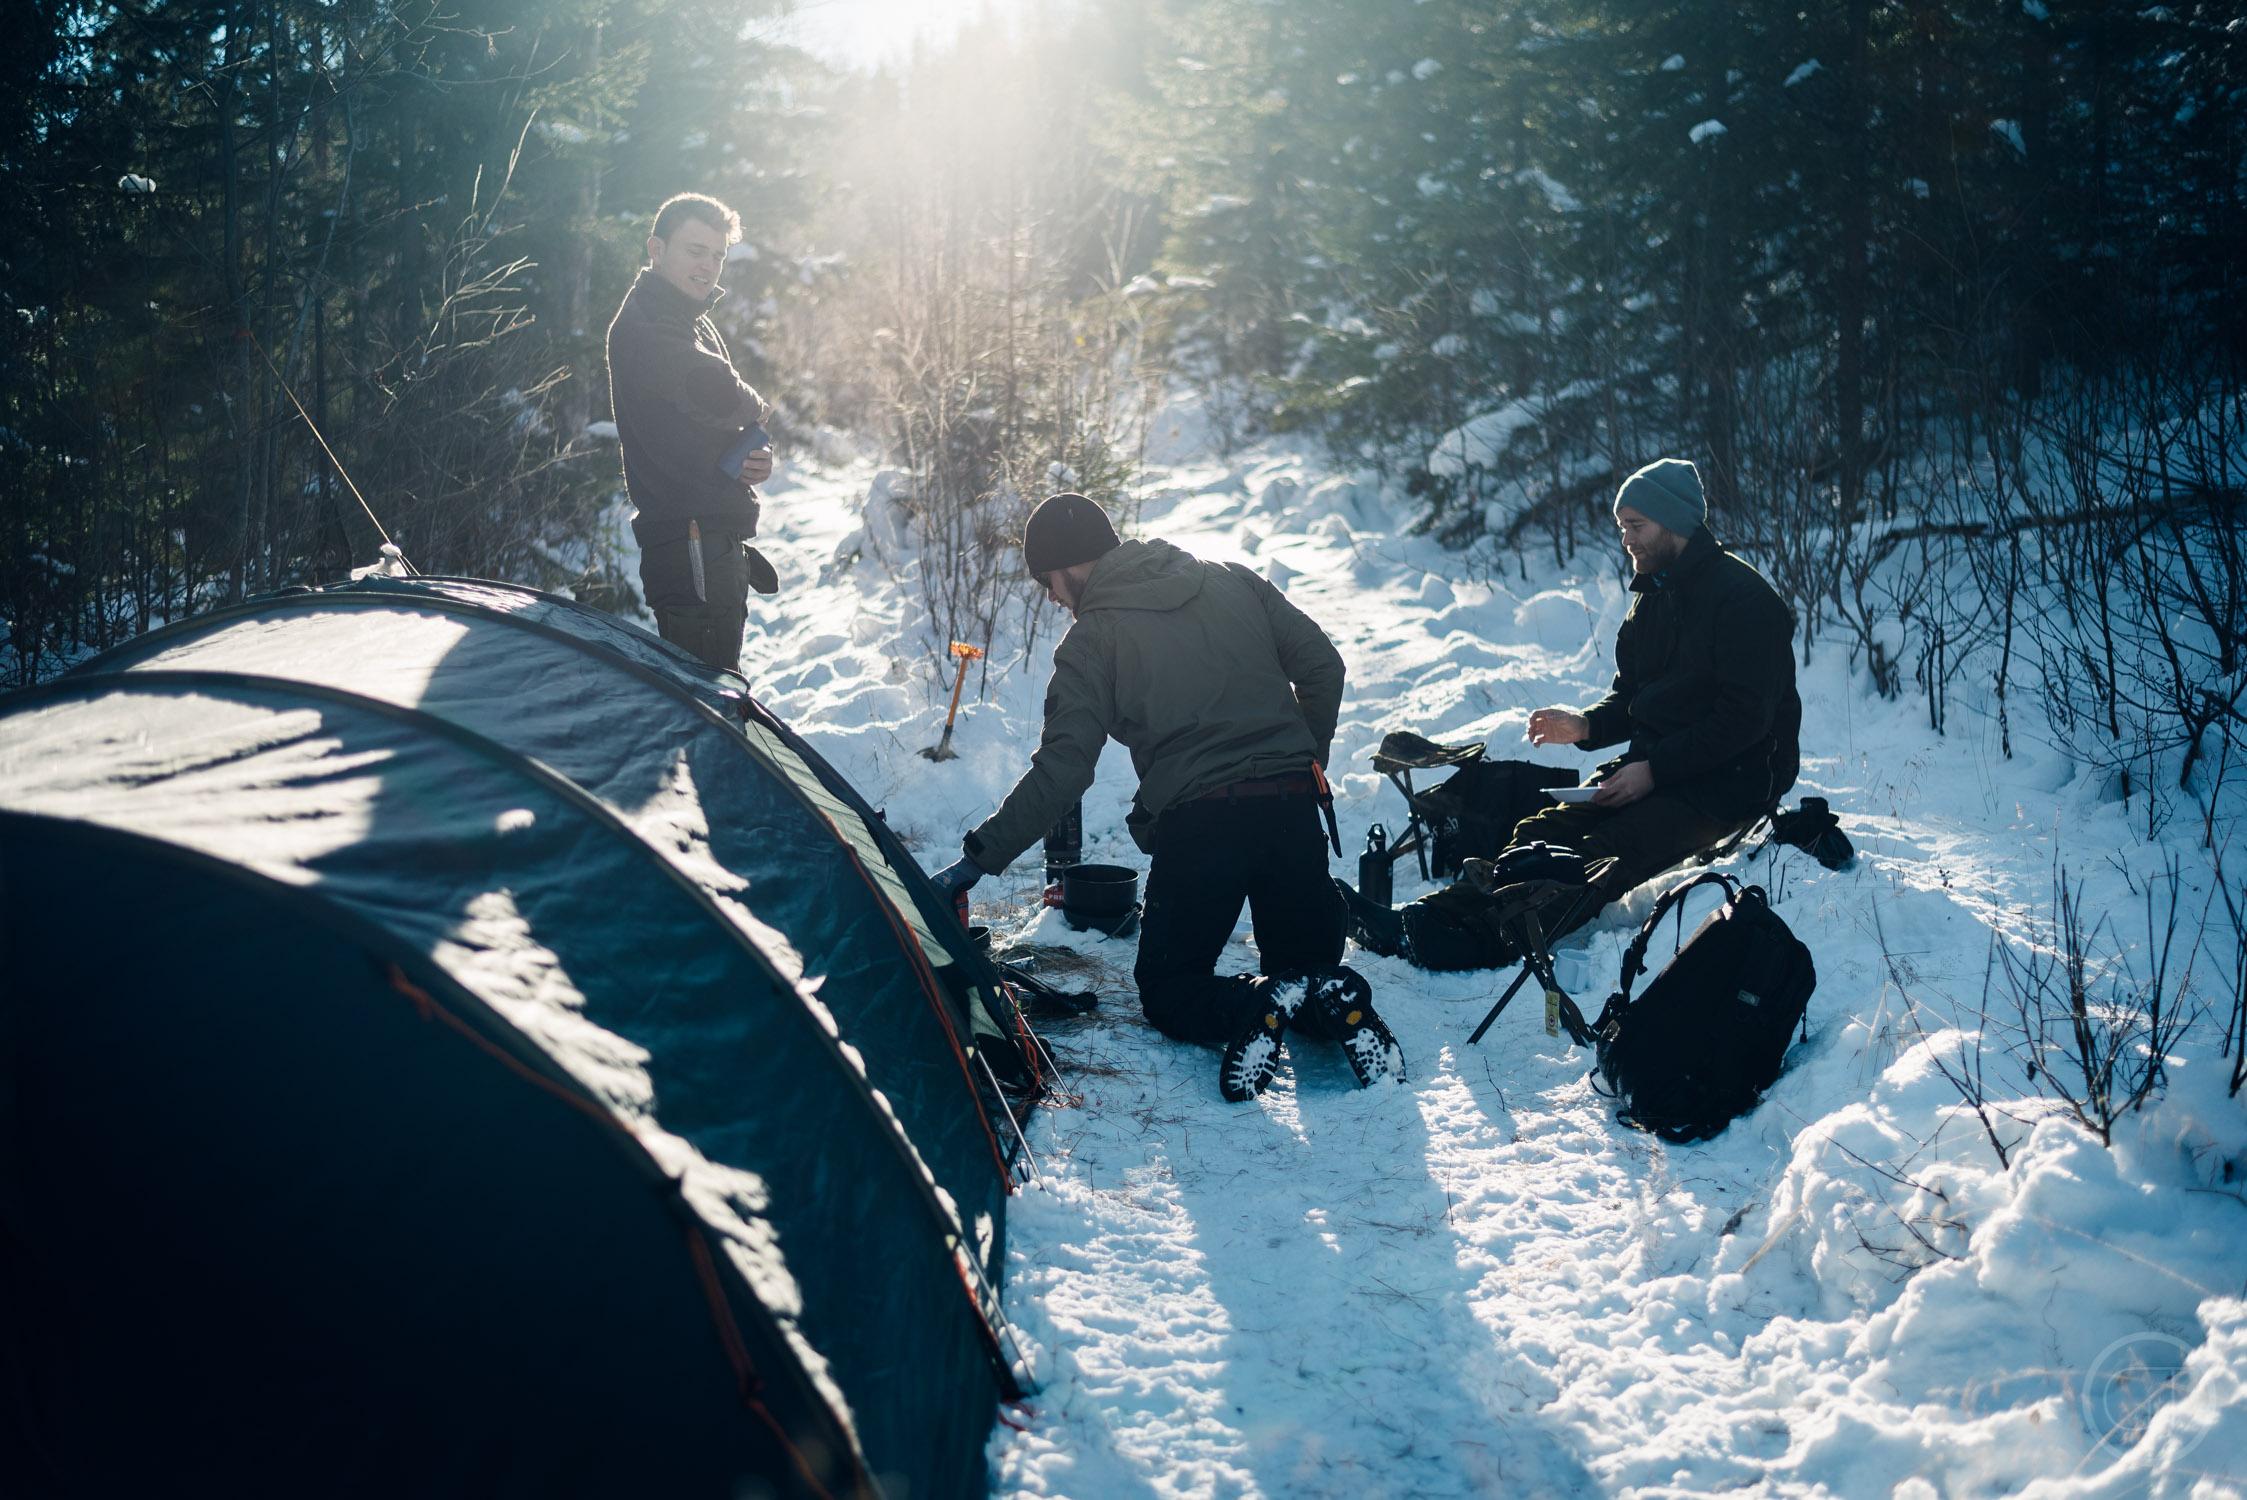 GUSTAV_THUESEN_HUNTING_NORWAY_OUTDOOR_LIFESTYLE_PHOTOGRAPHER_PROFESSIONAL-1.jpg